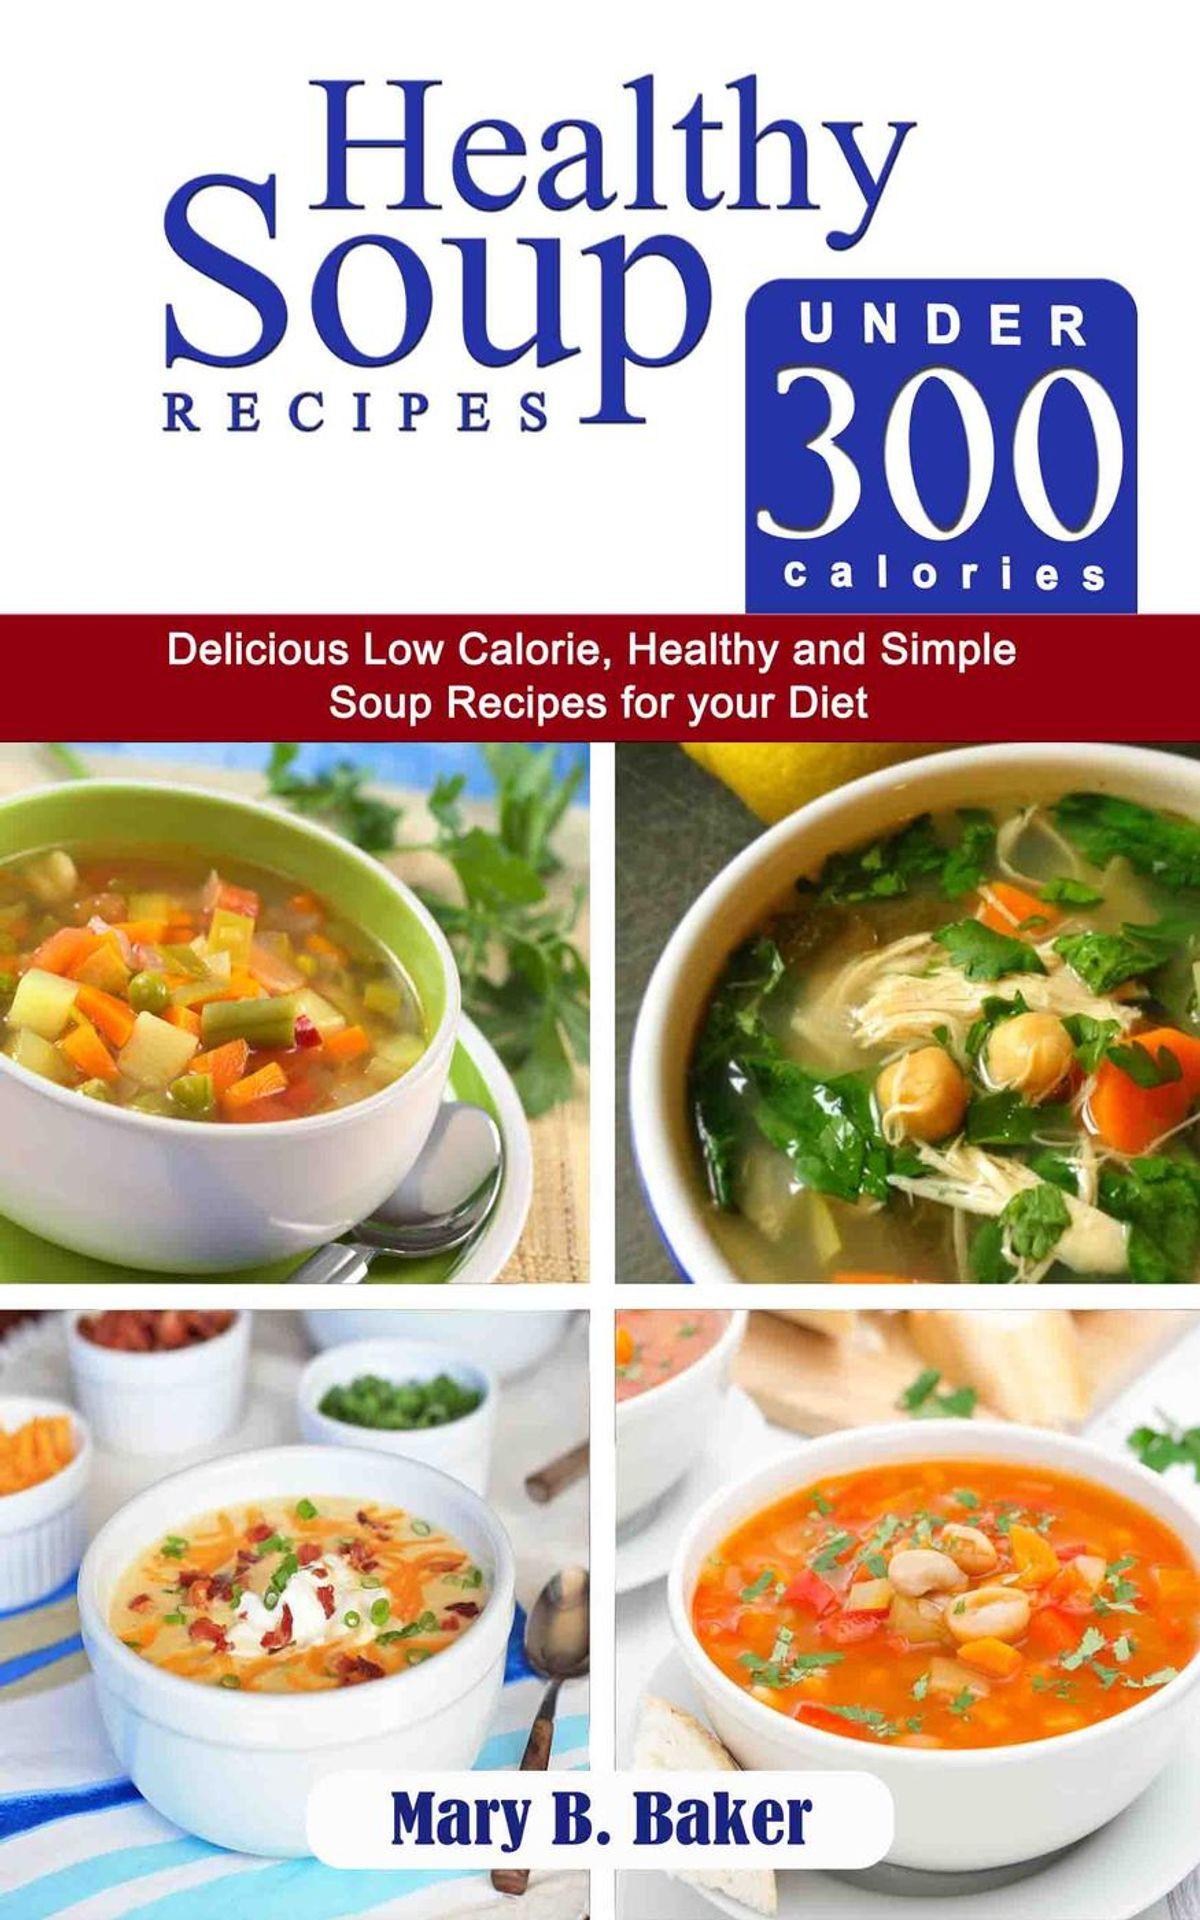 Healthy Low Calorie Soup Recipes  Healthy Soup Recipes under 300 Calories Delicious Low